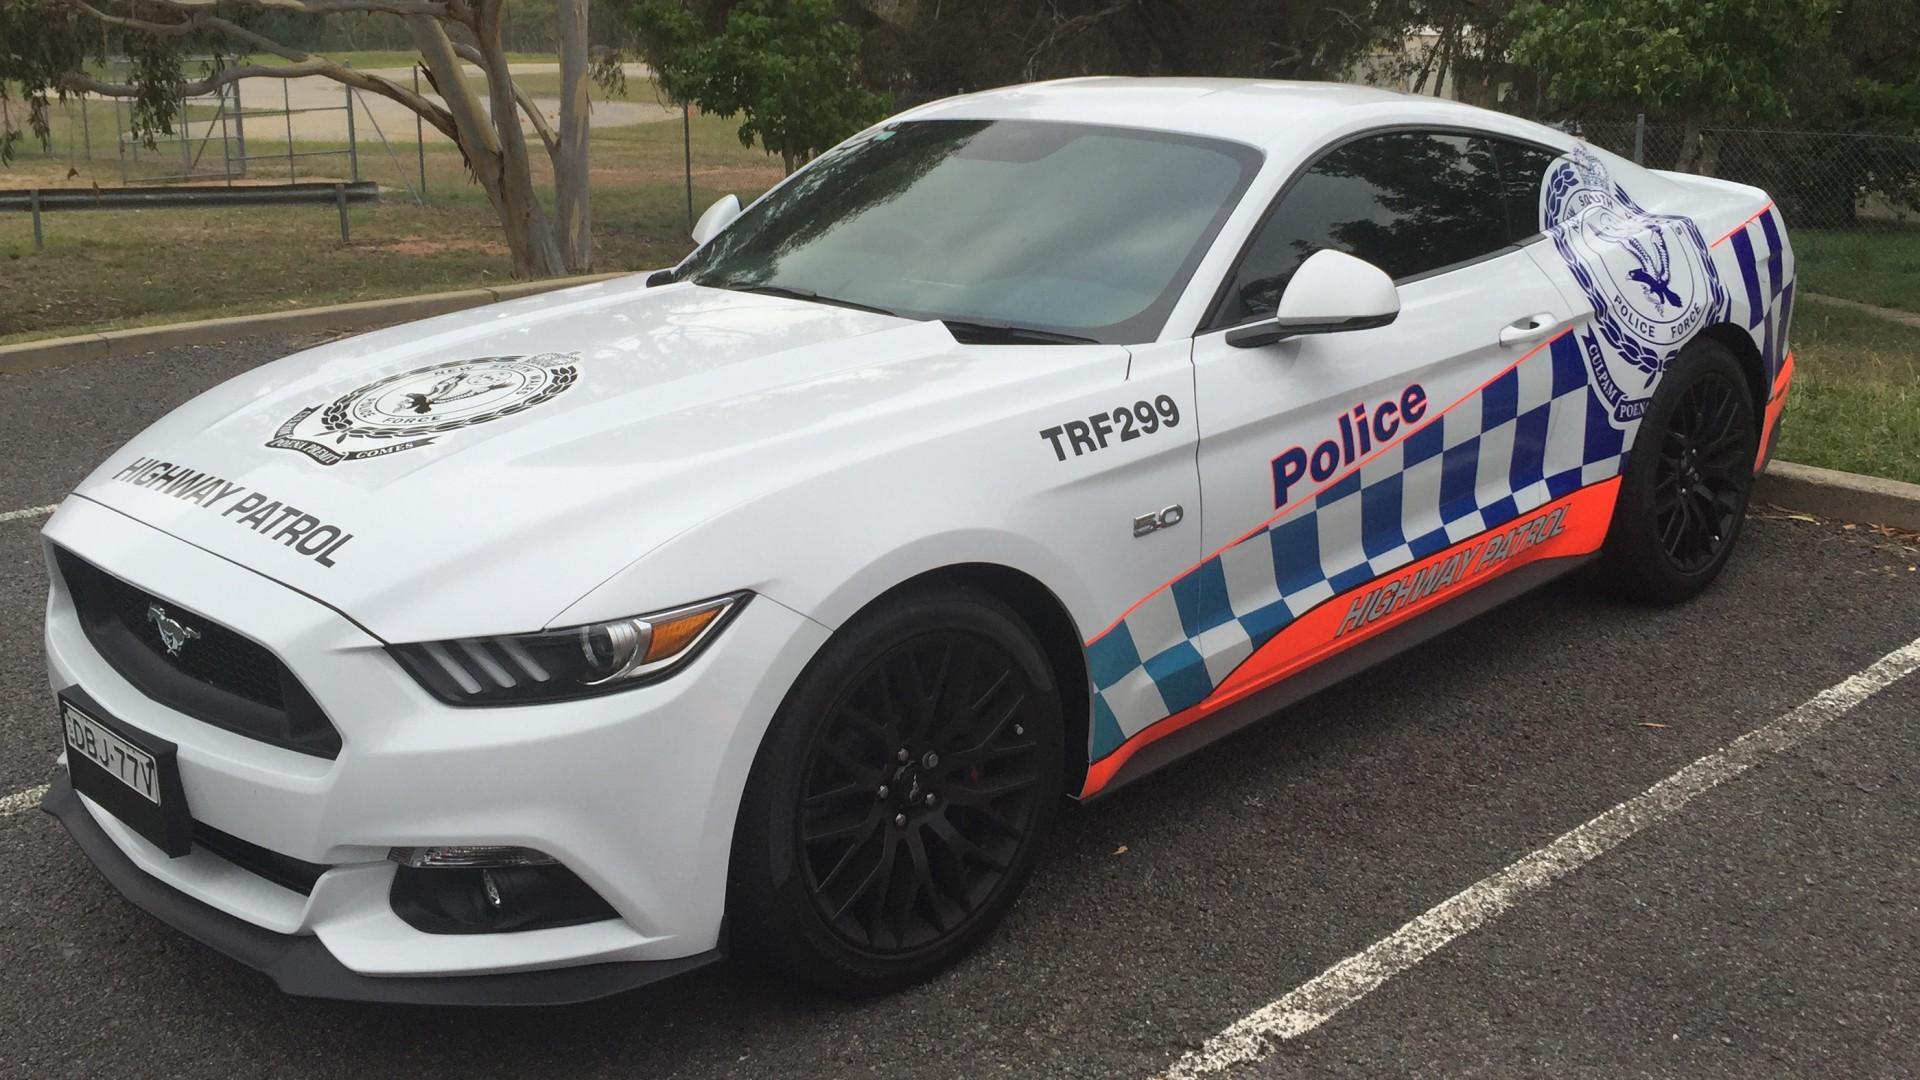 photos nsw police mustang highway patrol car eftm. Black Bedroom Furniture Sets. Home Design Ideas